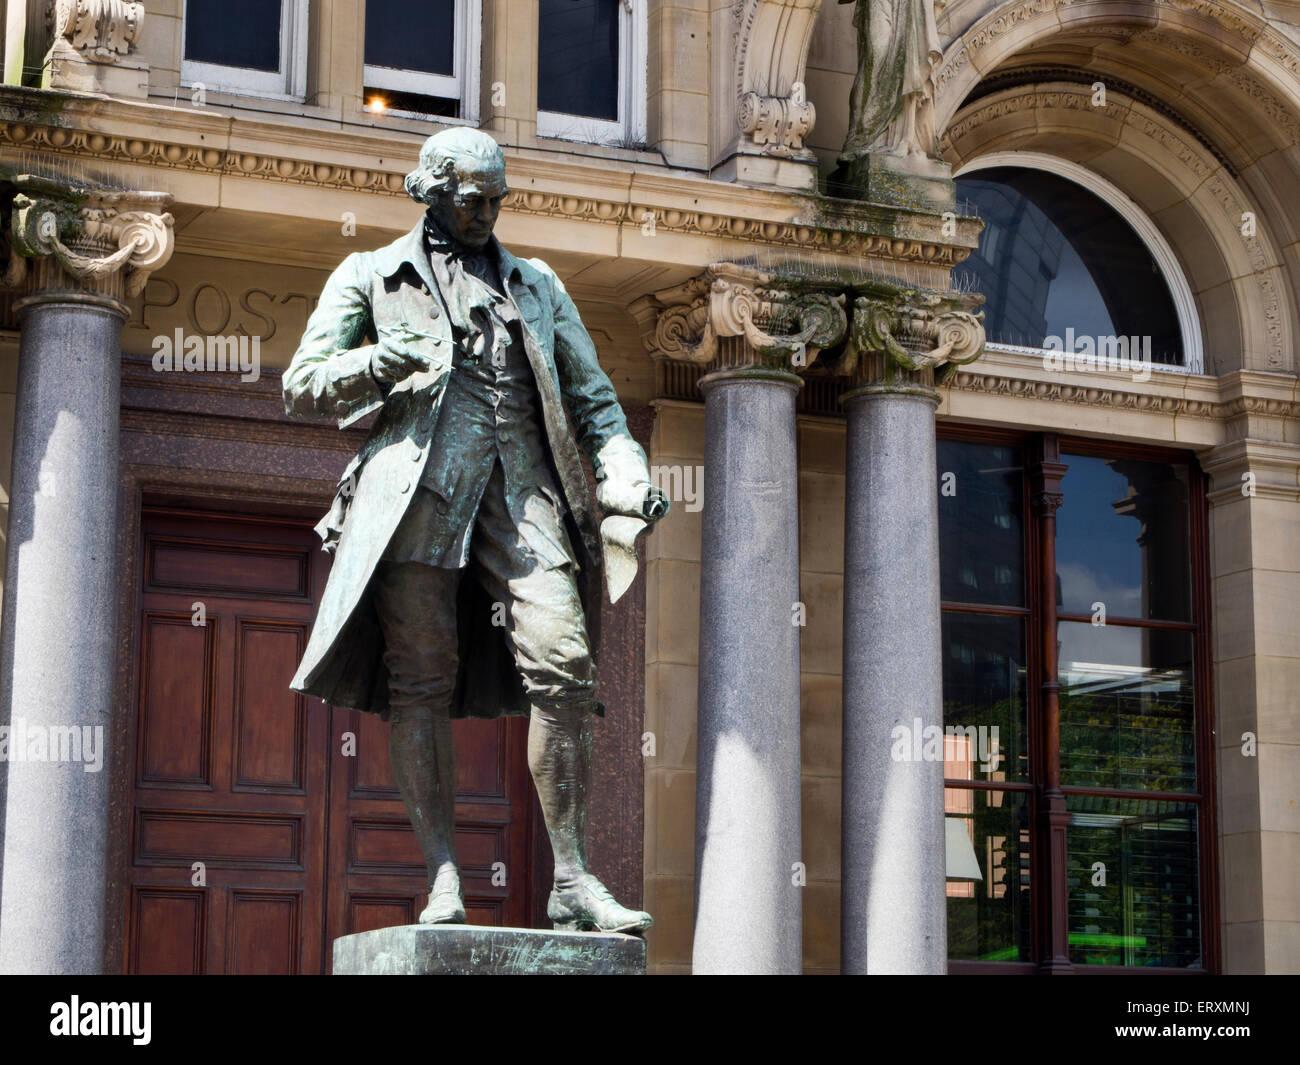 James Watt Statue in City Square Leeds West Yorkshire England - Stock Image